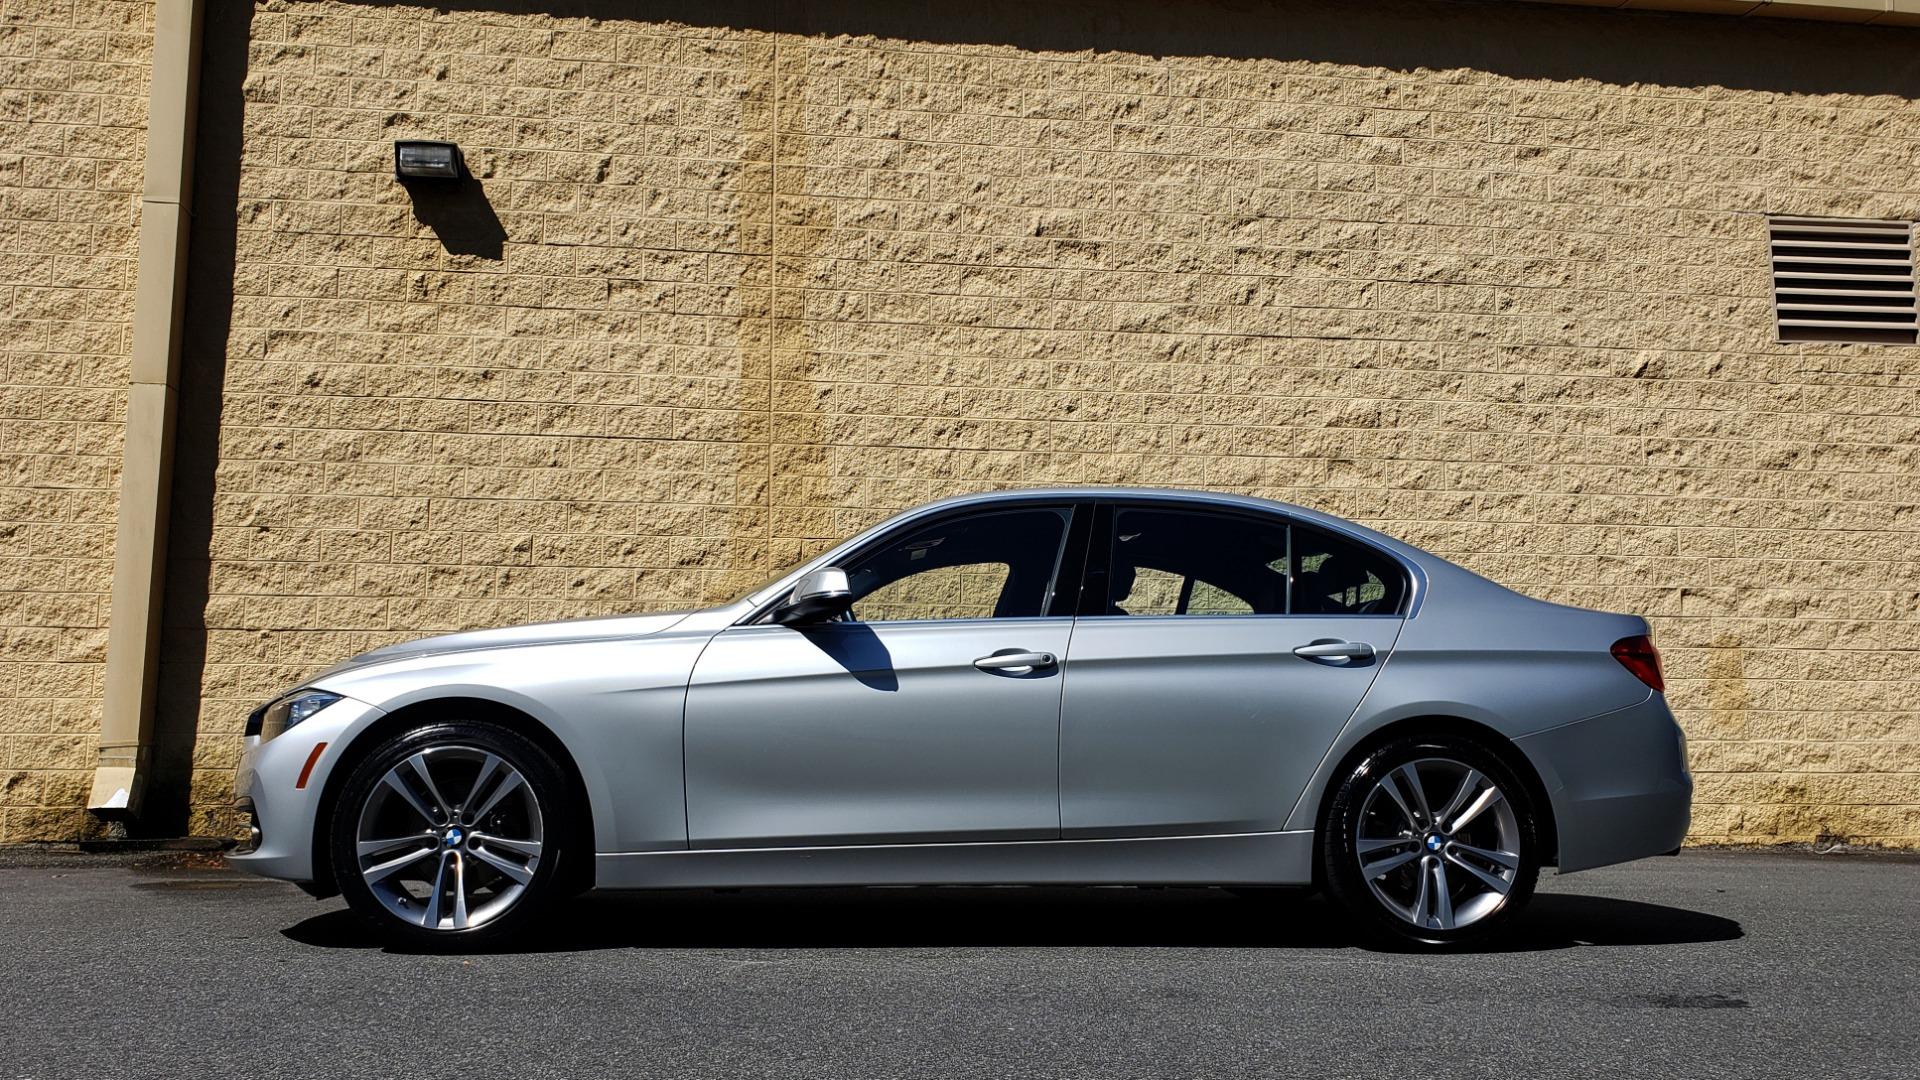 Used 2017 BMW 3 SERIES 330I SPORT SEDAN / DRVR ASST PKG / SUNROOF / REARVIEW for sale Sold at Formula Imports in Charlotte NC 28227 2